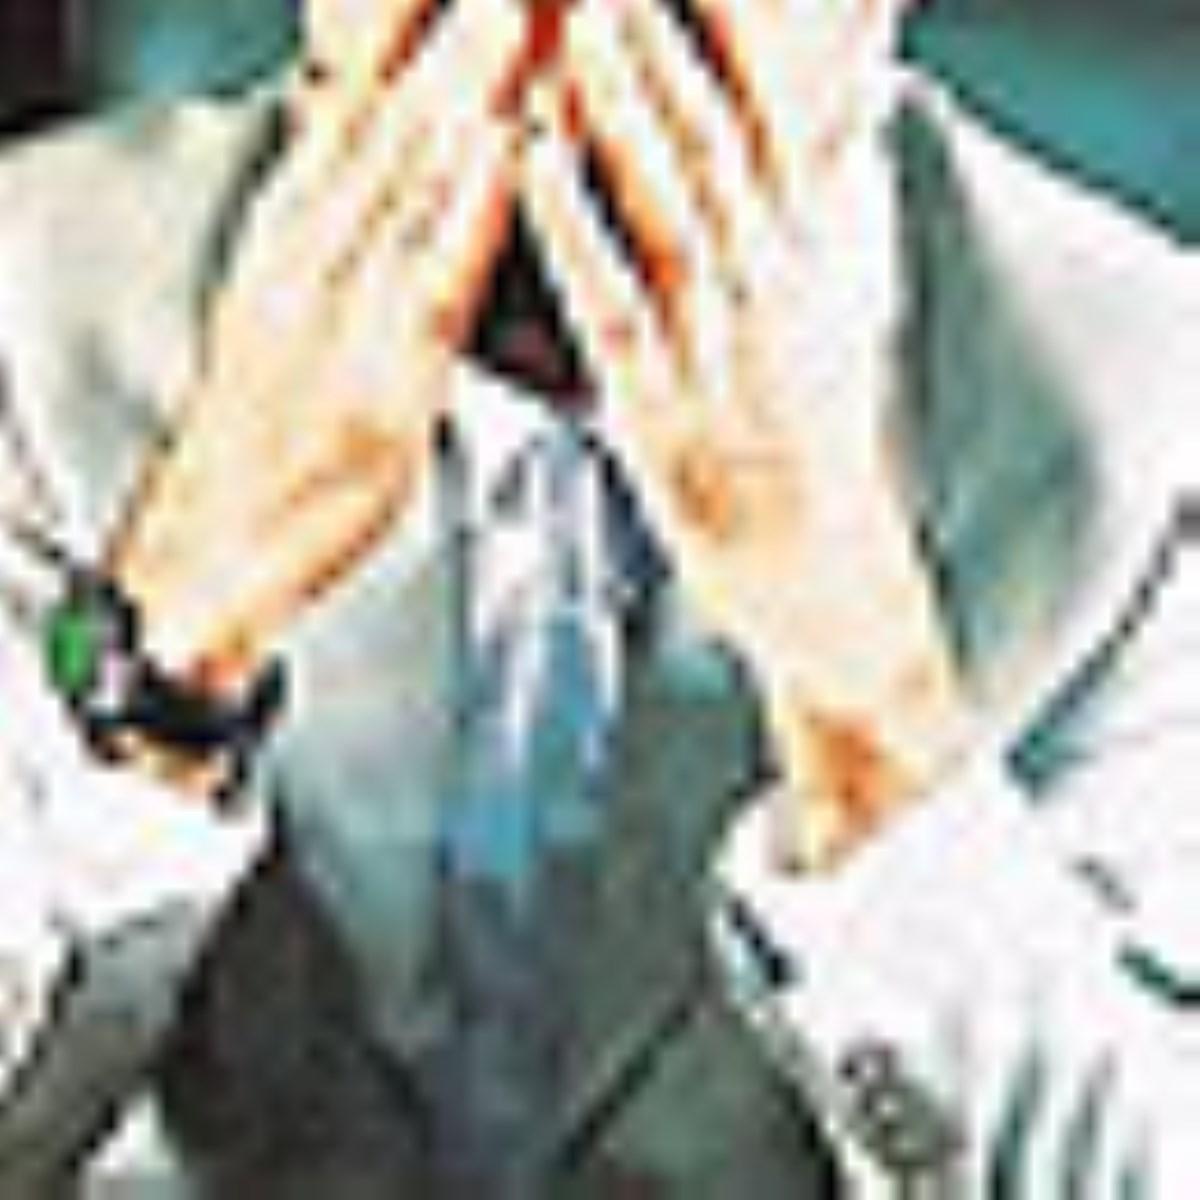 تحليلي روانشناختي بر اختلالات اضطرابي